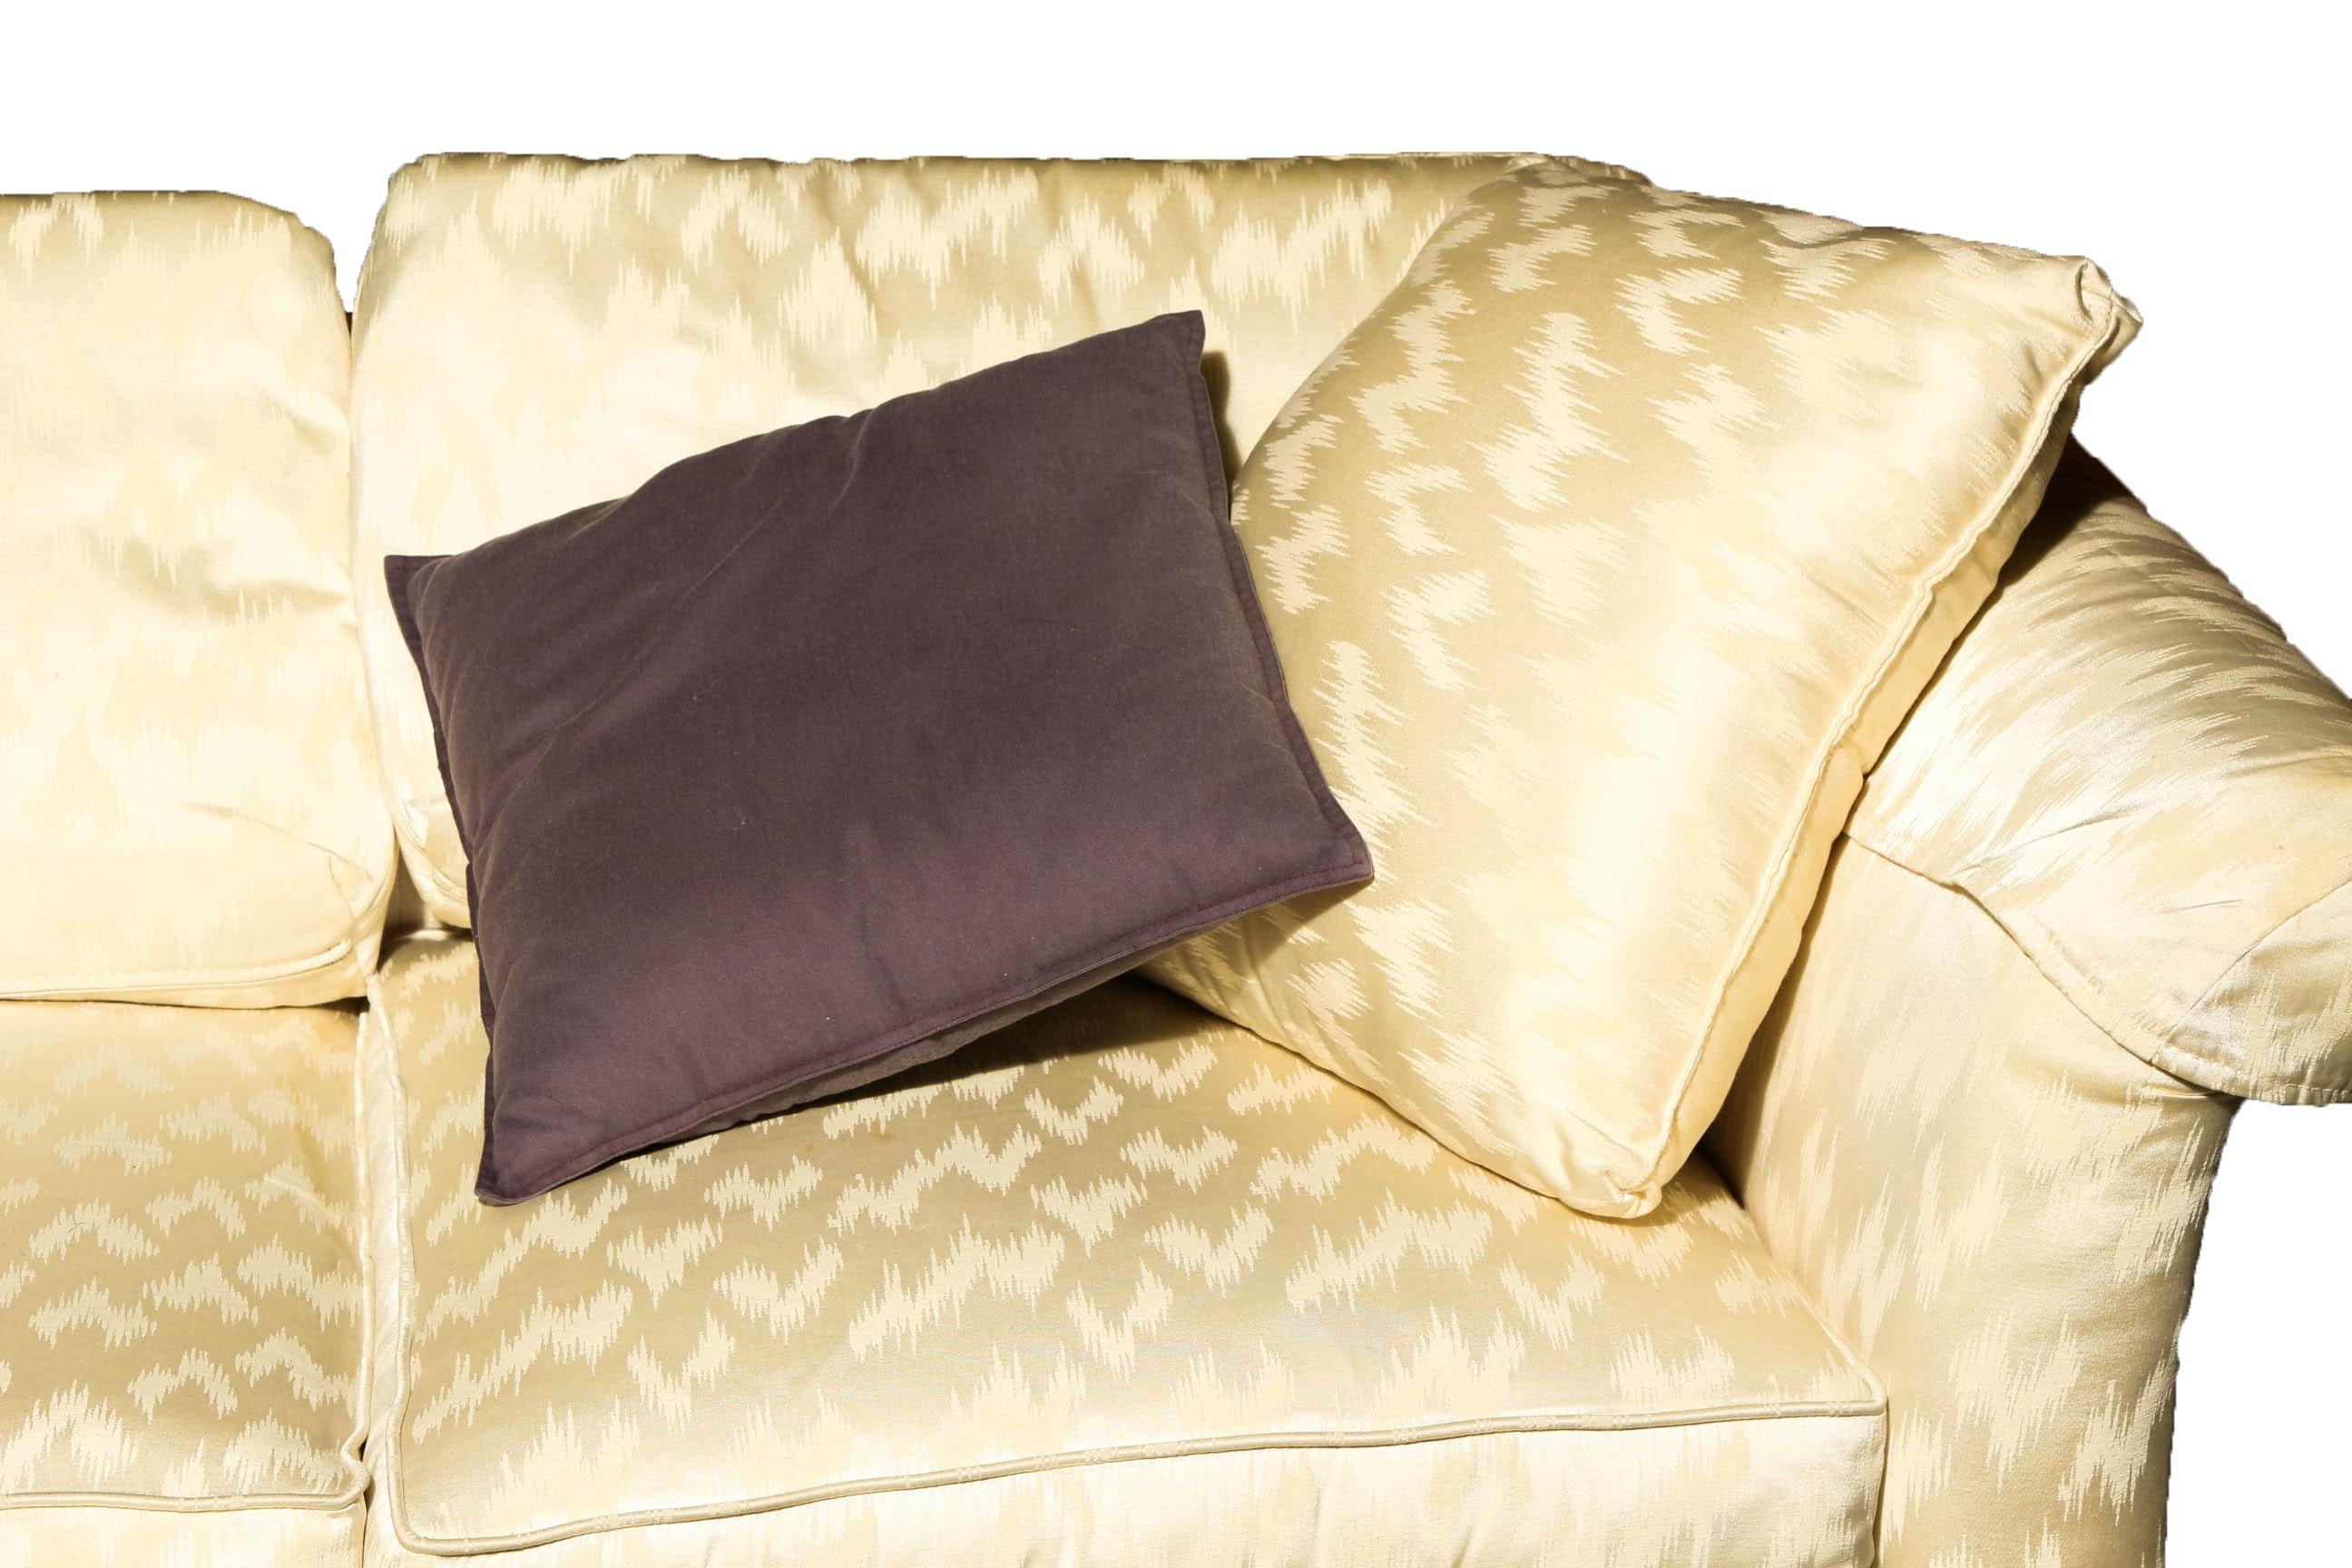 Vintage Sofa With Accent Pillows EBTH : IMG017020copyjpgixlibrb 11 from www.ebth.com size 1400 x 933 jpeg 202kB